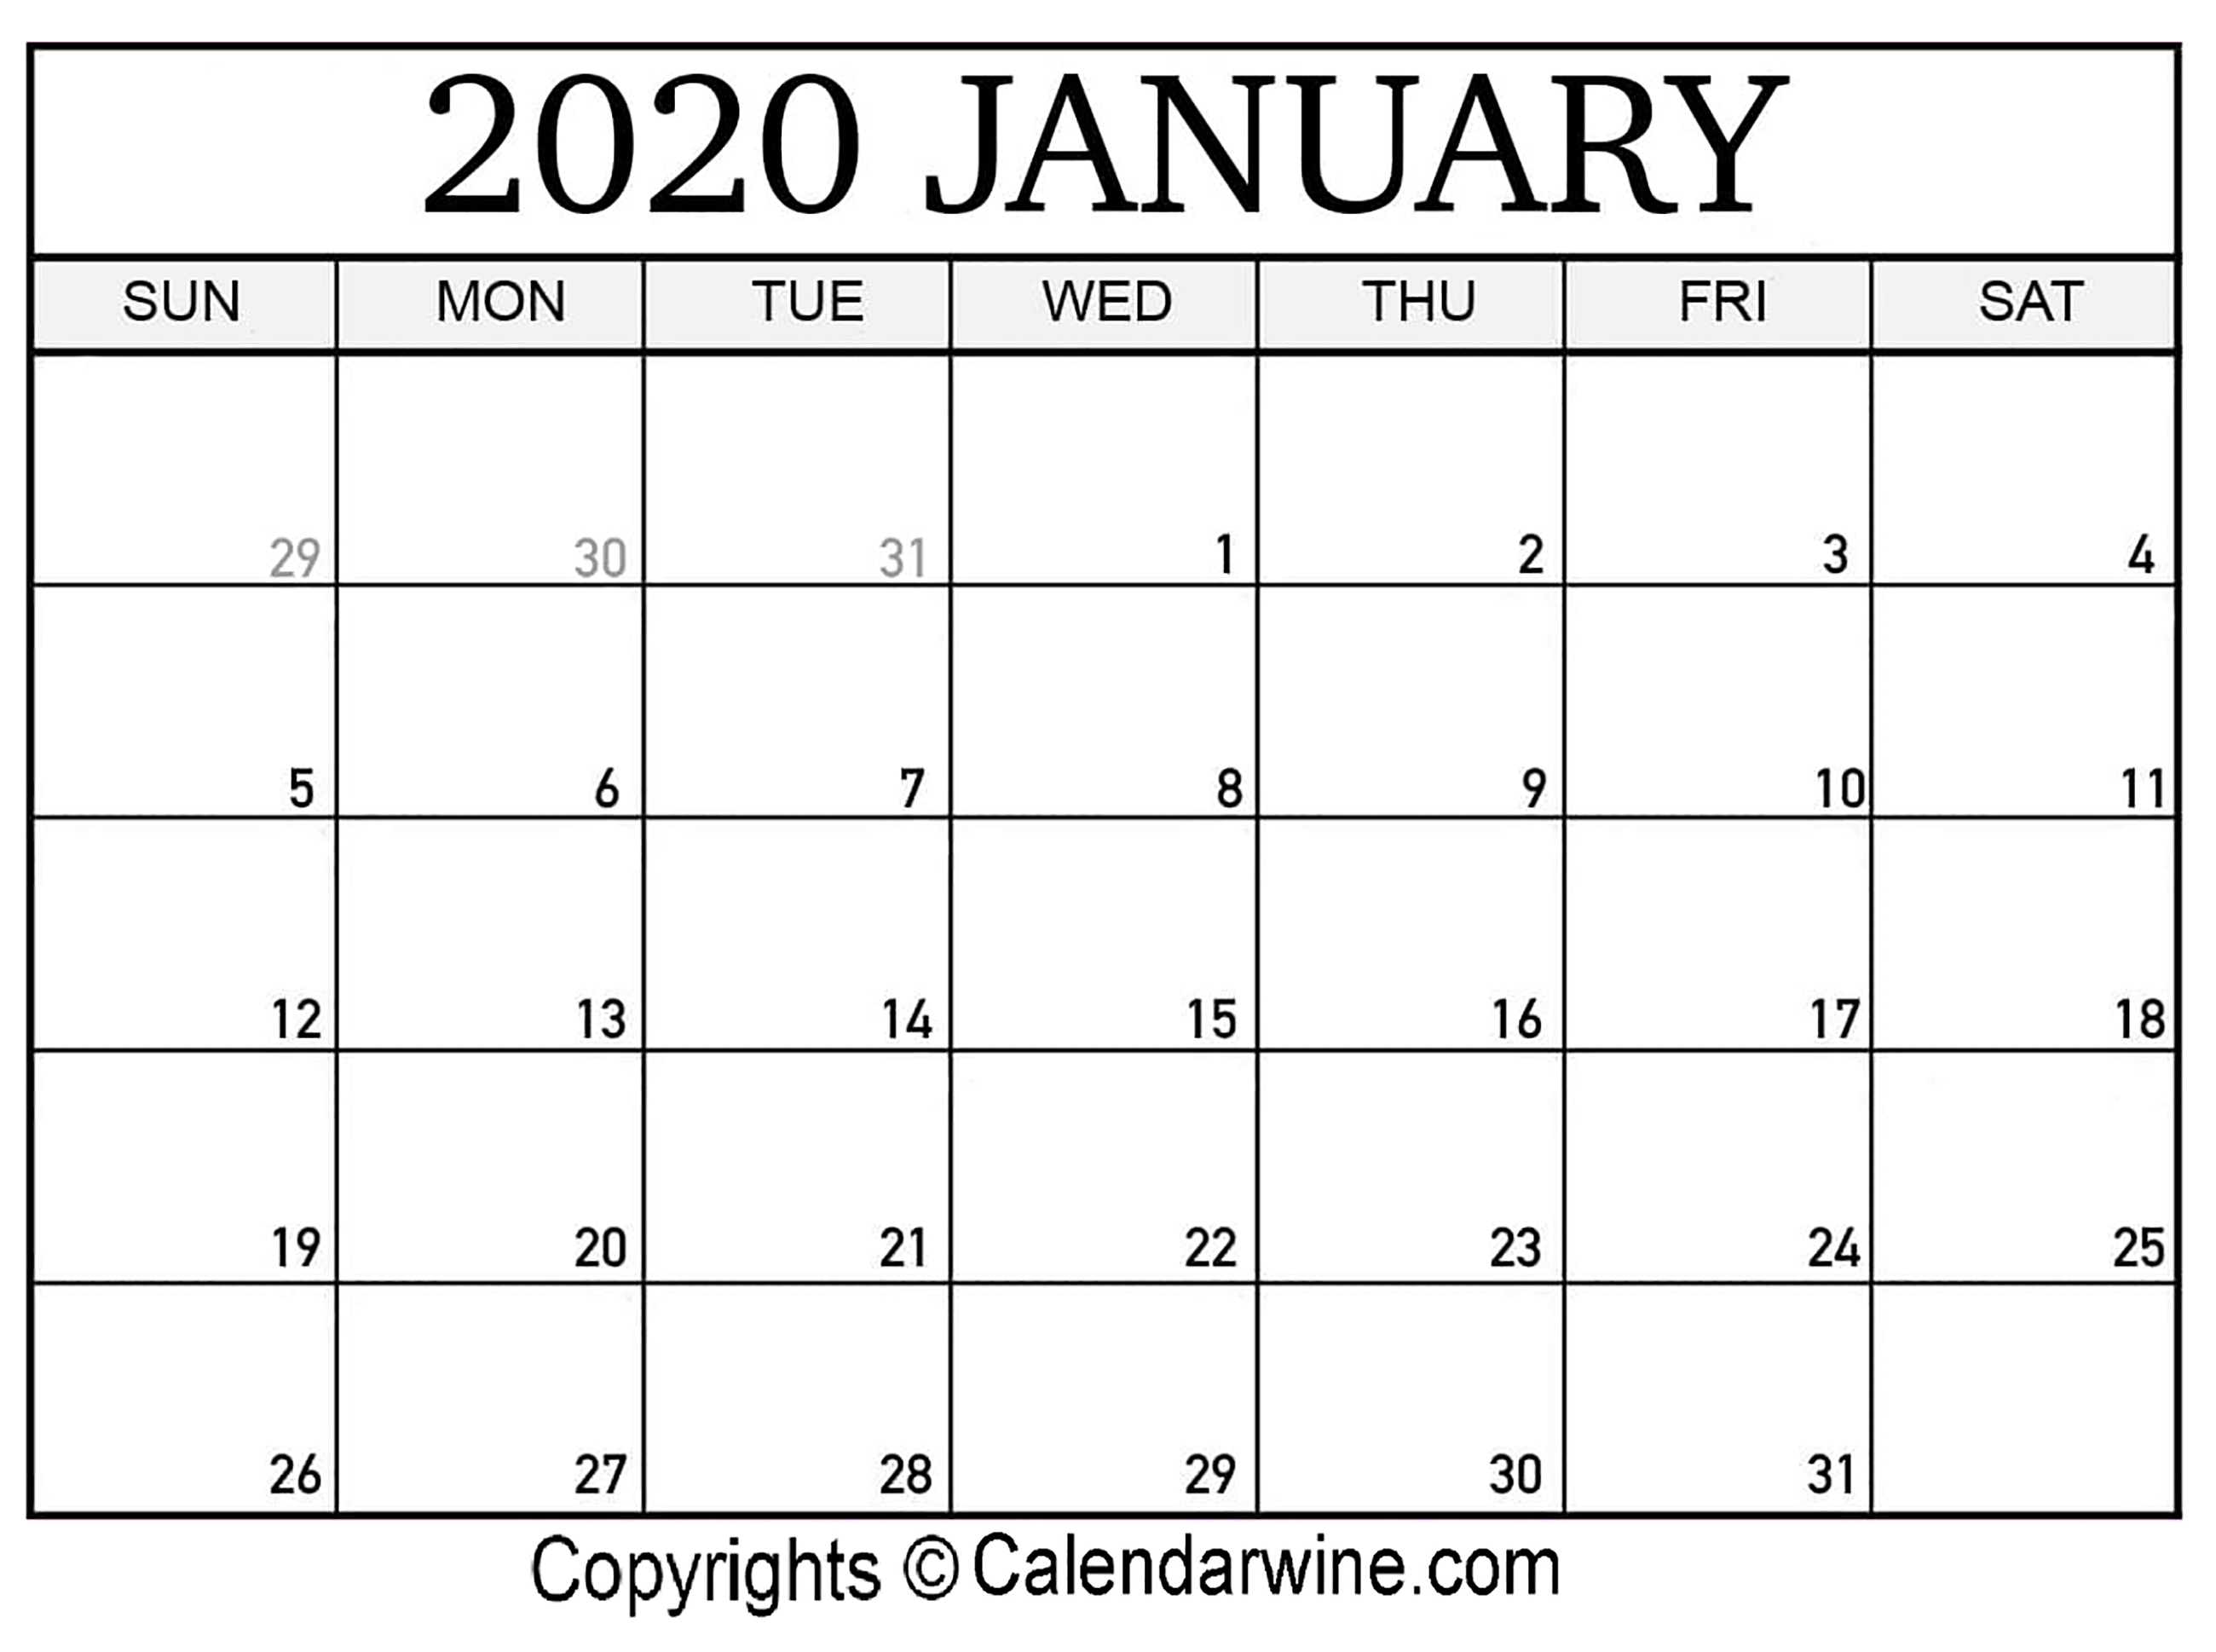 January 2020 Printable Calendar Templates | Calendar Wine inside 2020 Calendars To Print Without Downloading